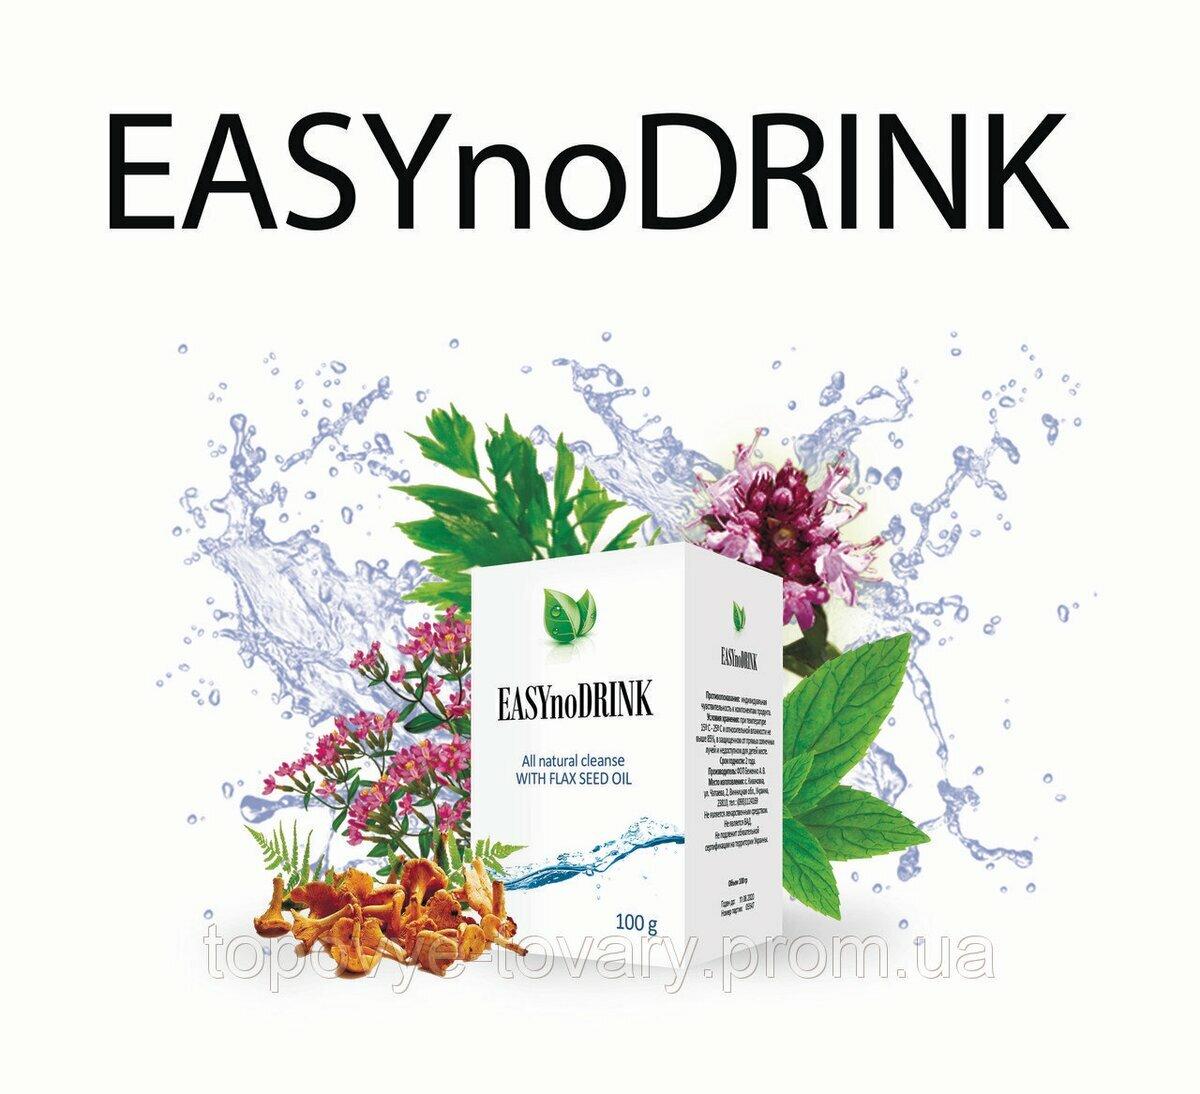 EASYnoDRINK концентрат от алкоголизма в Северодвинске